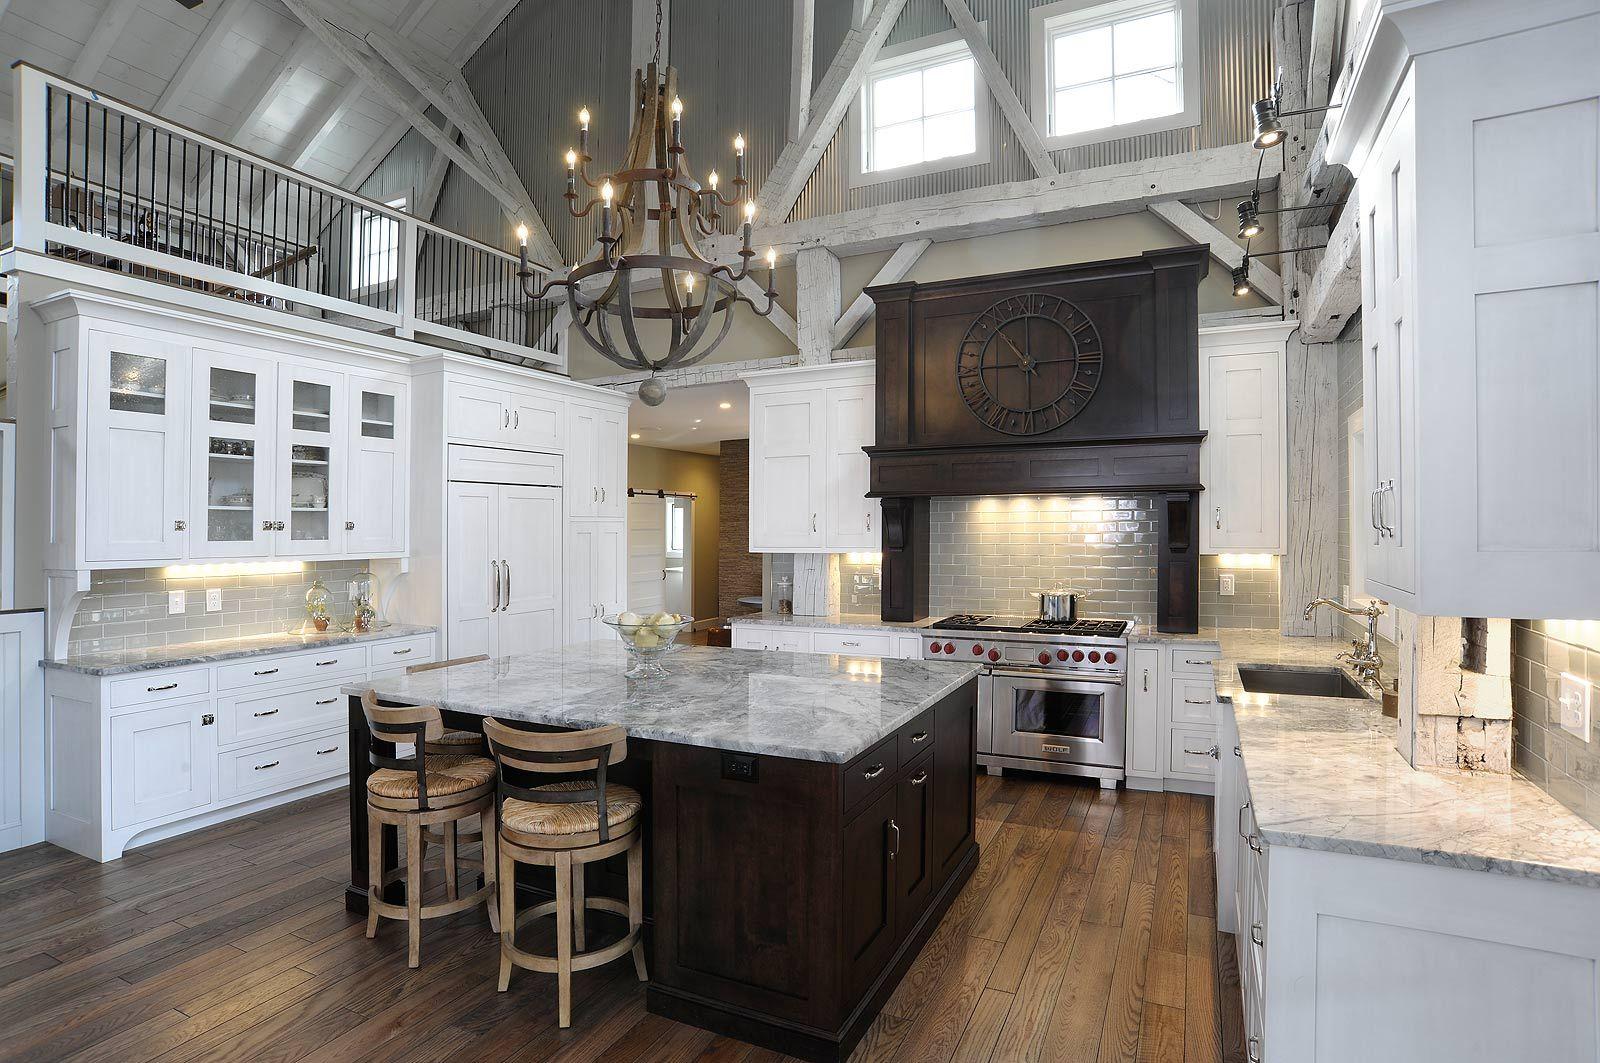 New Rebuilt Timber Frame Barn Home Kitchen  Kitchen Design Adorable Townhouse Kitchen Design Ideas Design Ideas